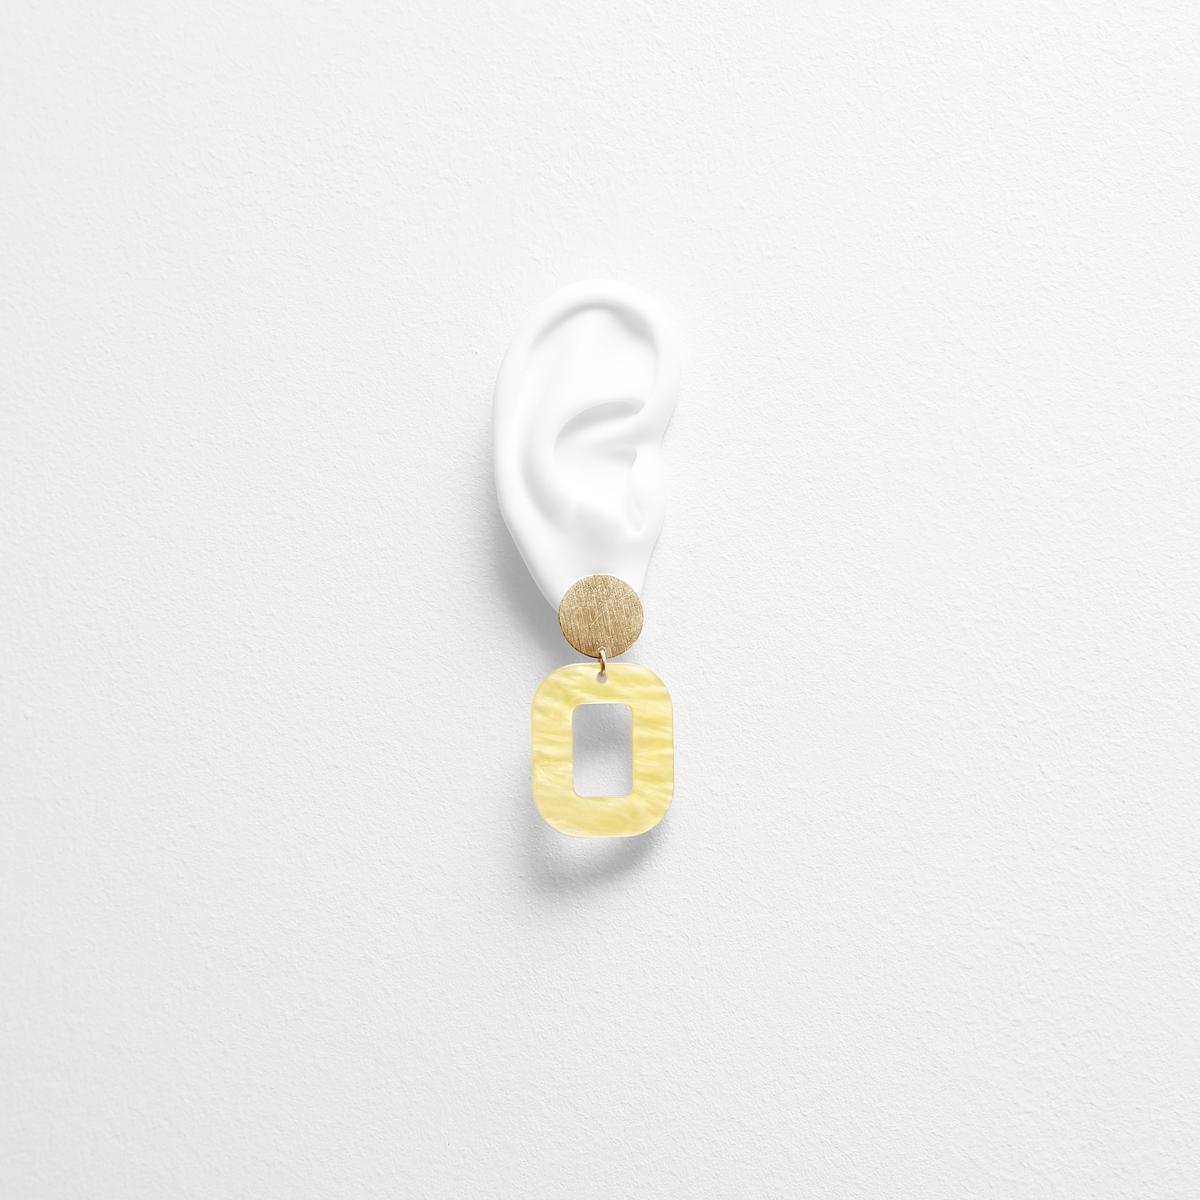 pastel-yellow-baby-rosa-earrings-try-on-FG.jpg